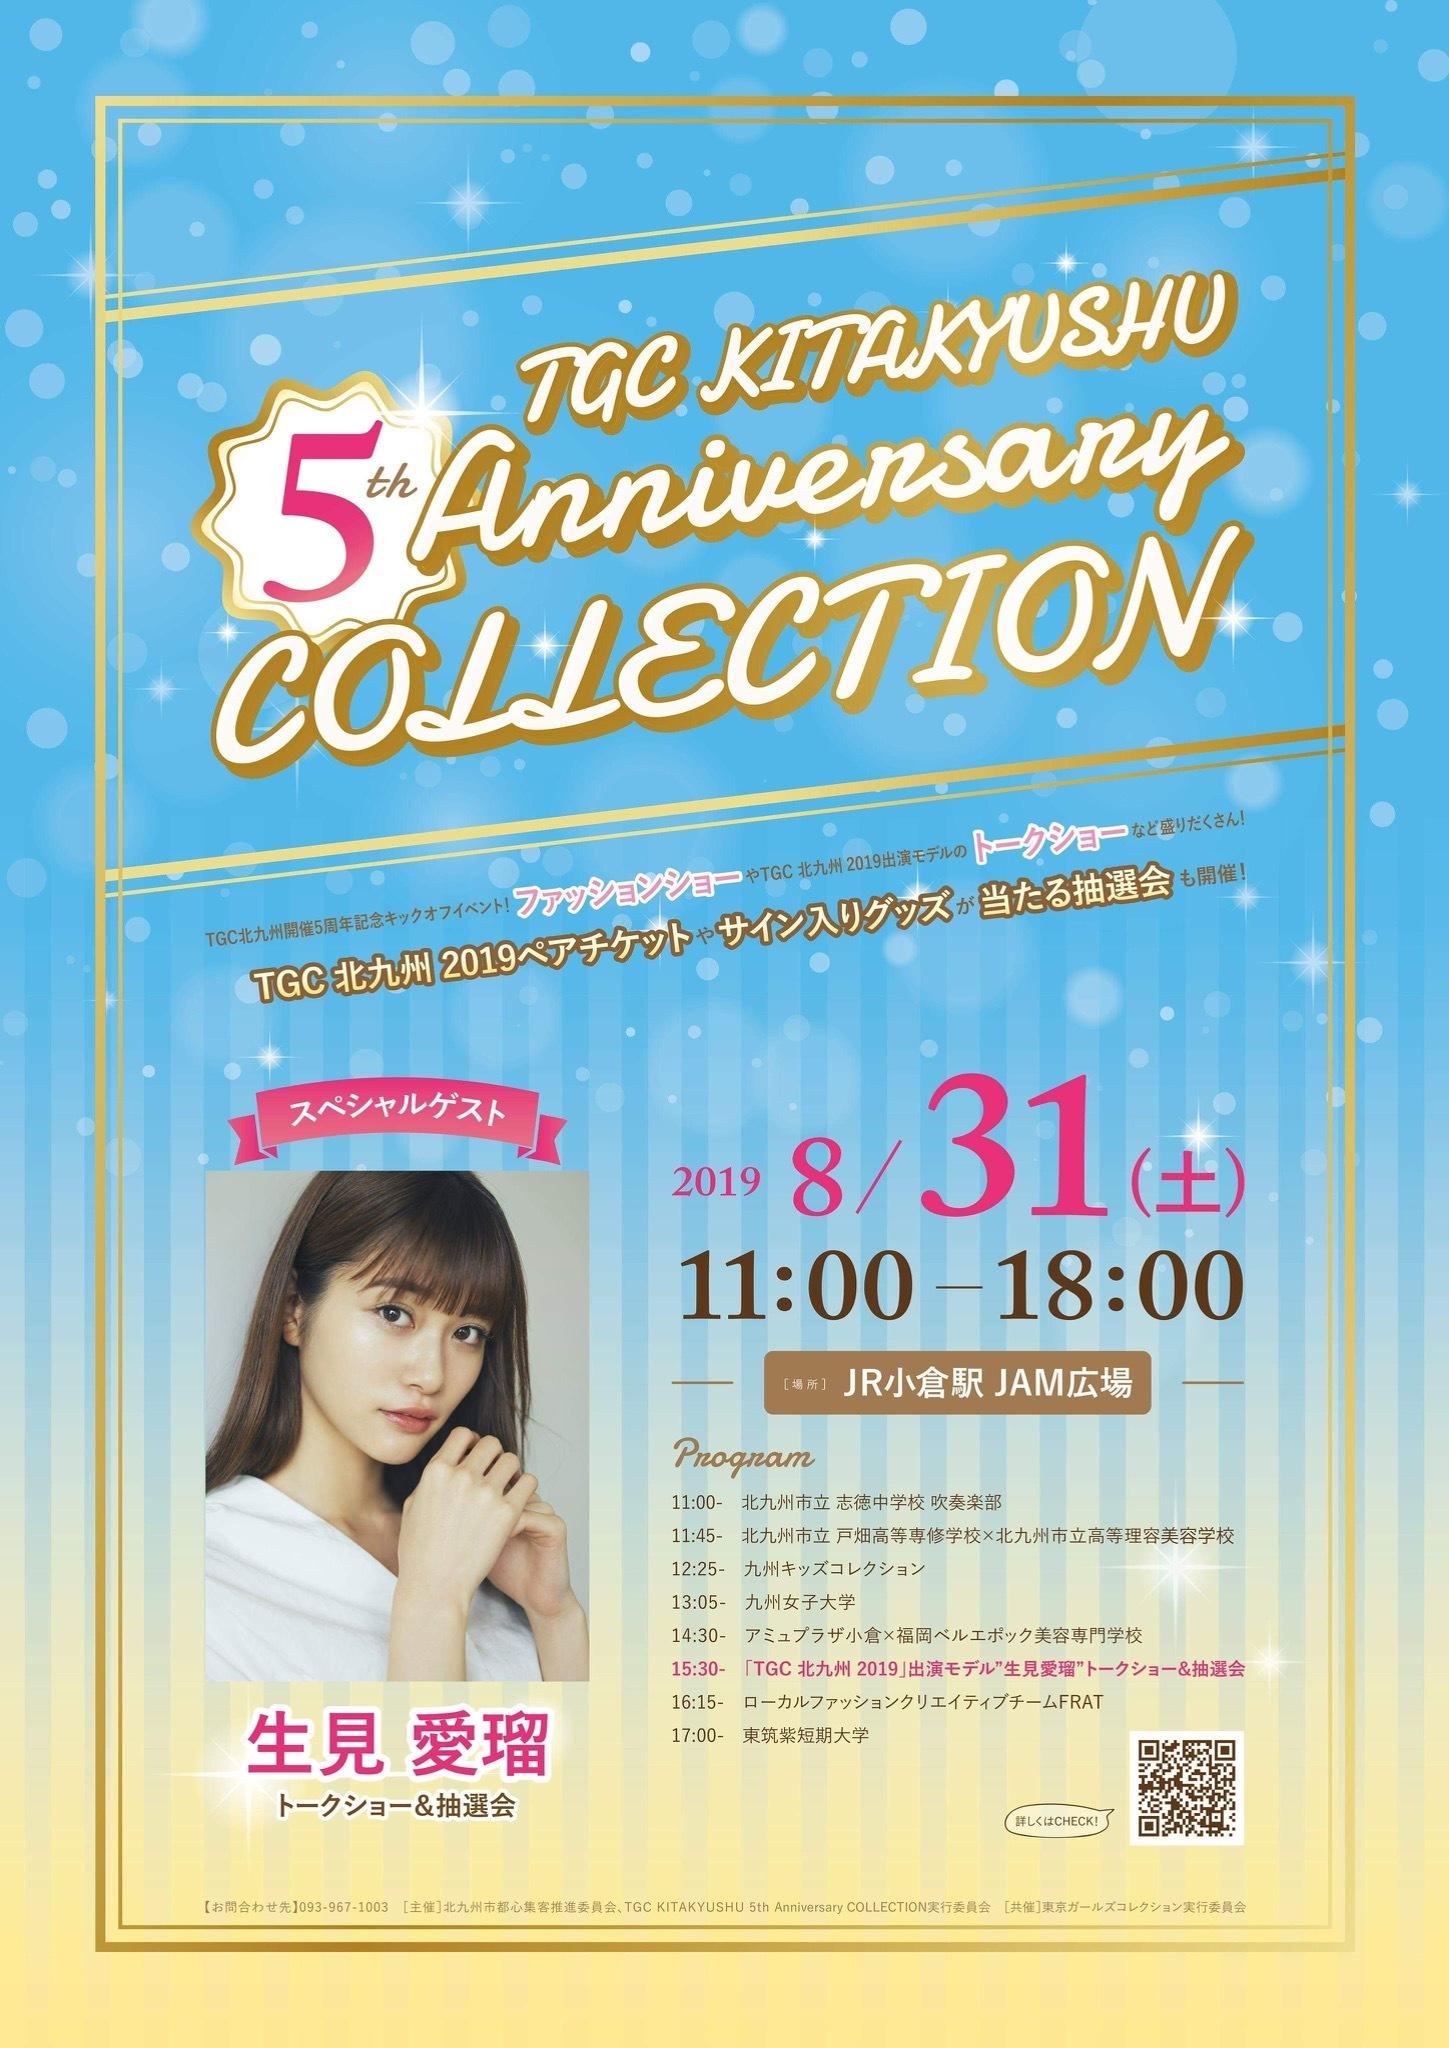 TGC北九州5周年コレクション